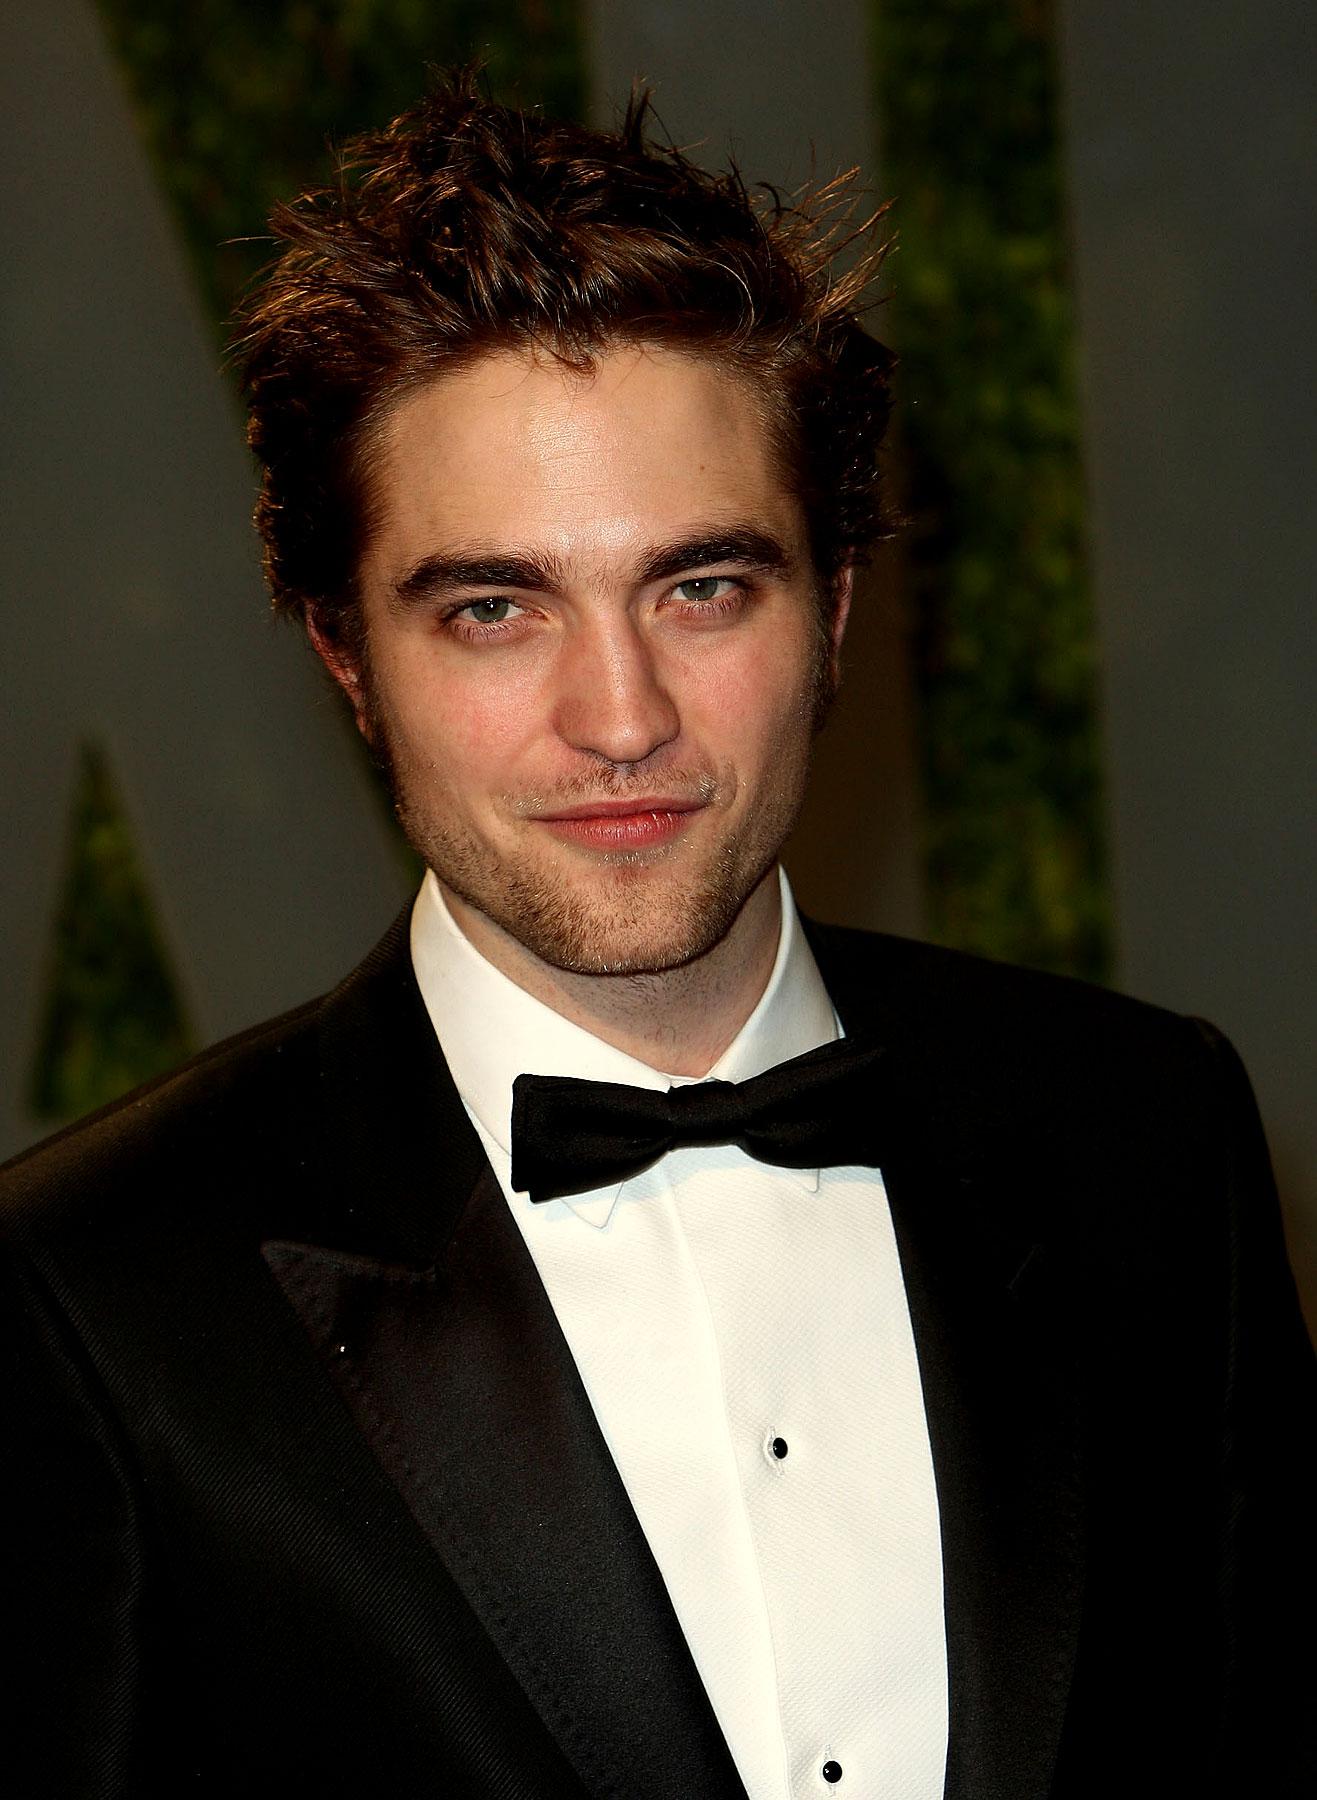 PHOTO GALLERY: Robert Pattinson, Best-Dressed?